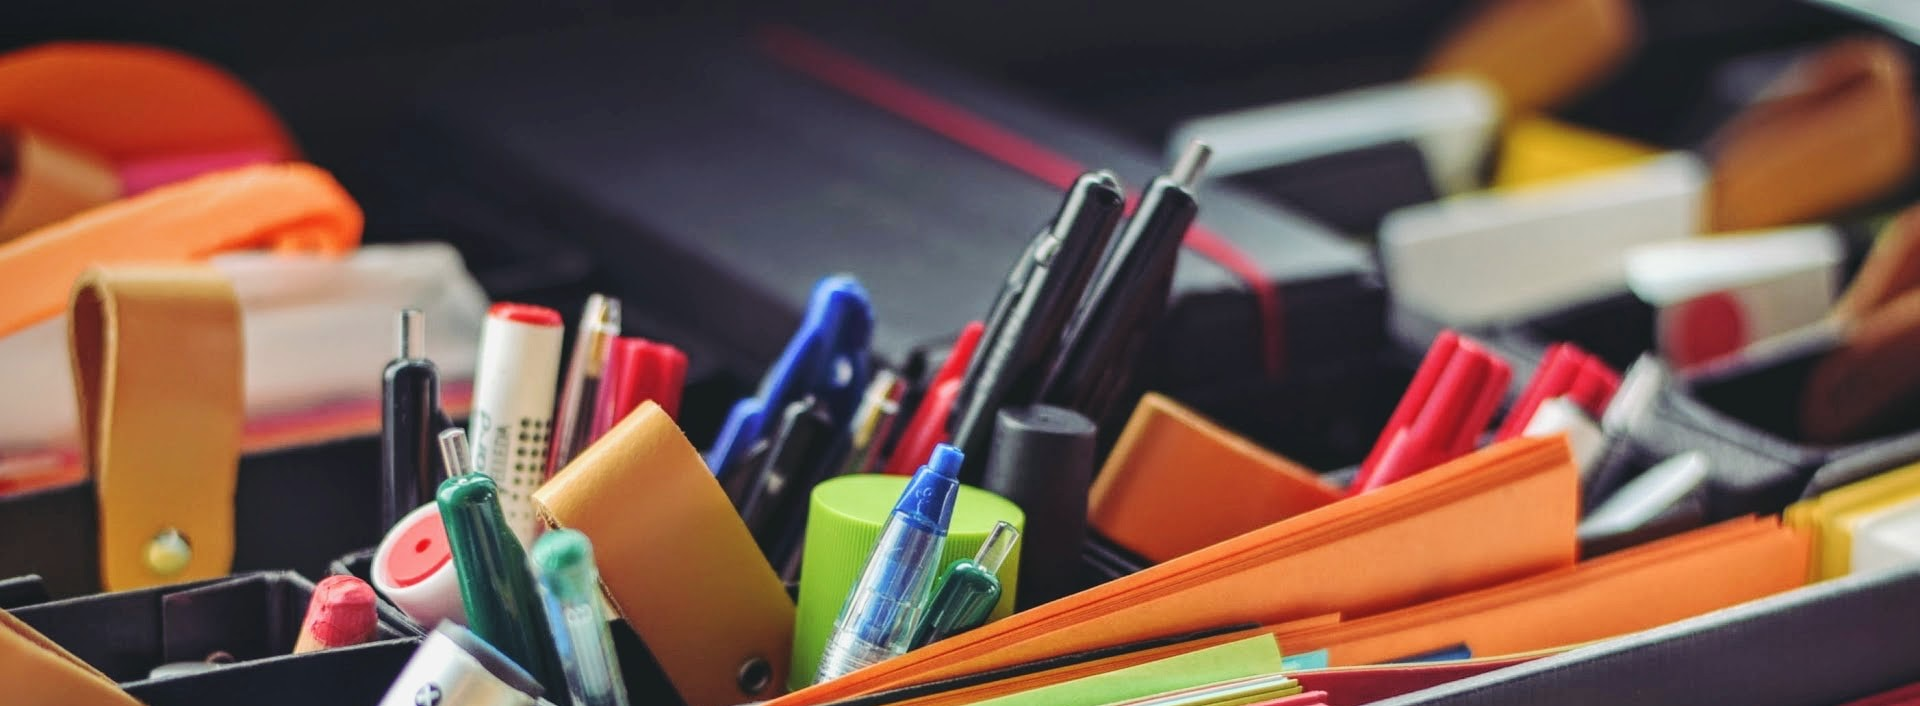 Office supplies in a desk organizer on a desk.